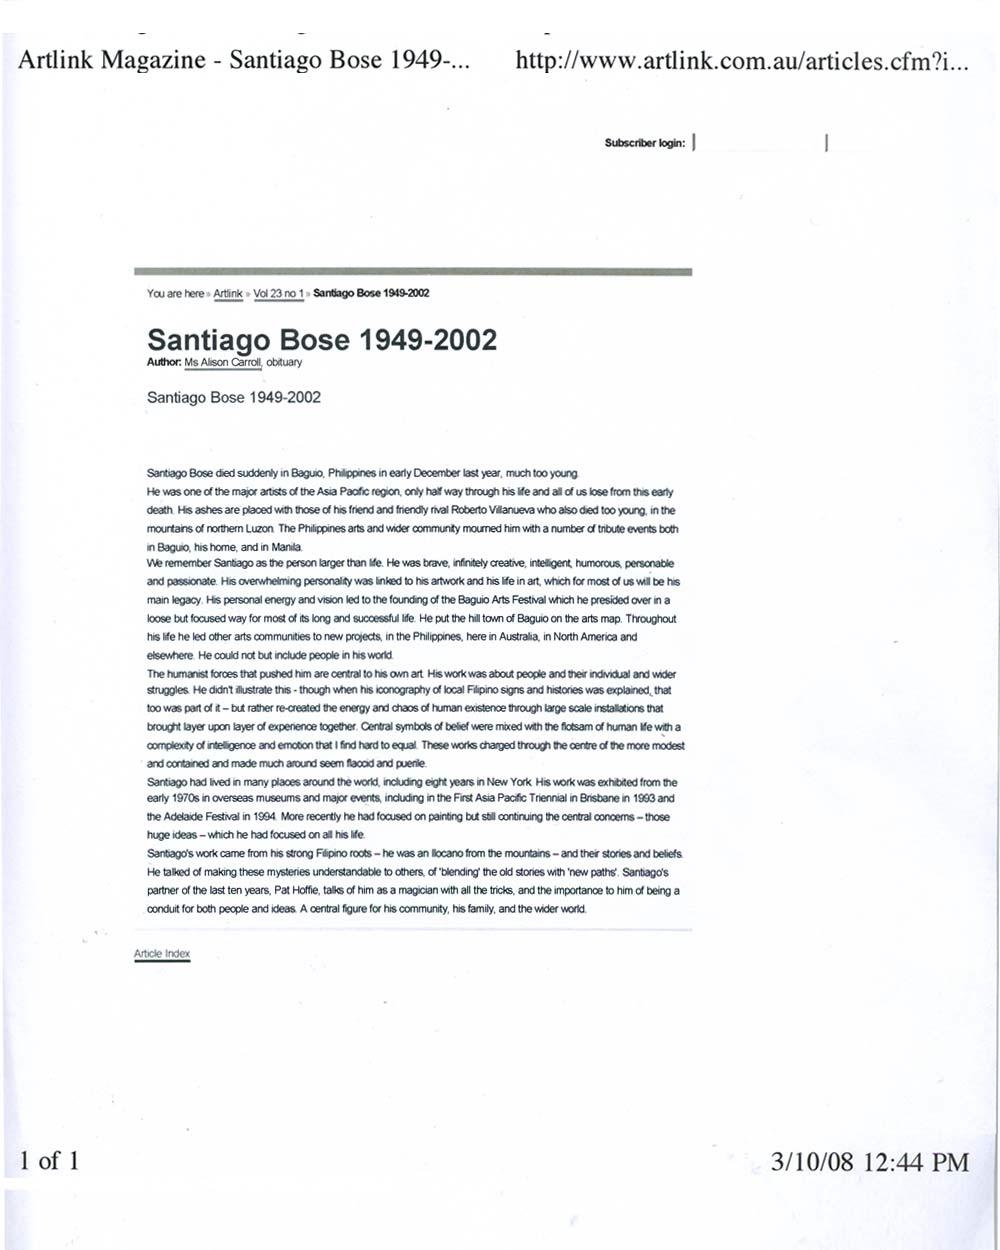 Santiago Bose 1949-2002